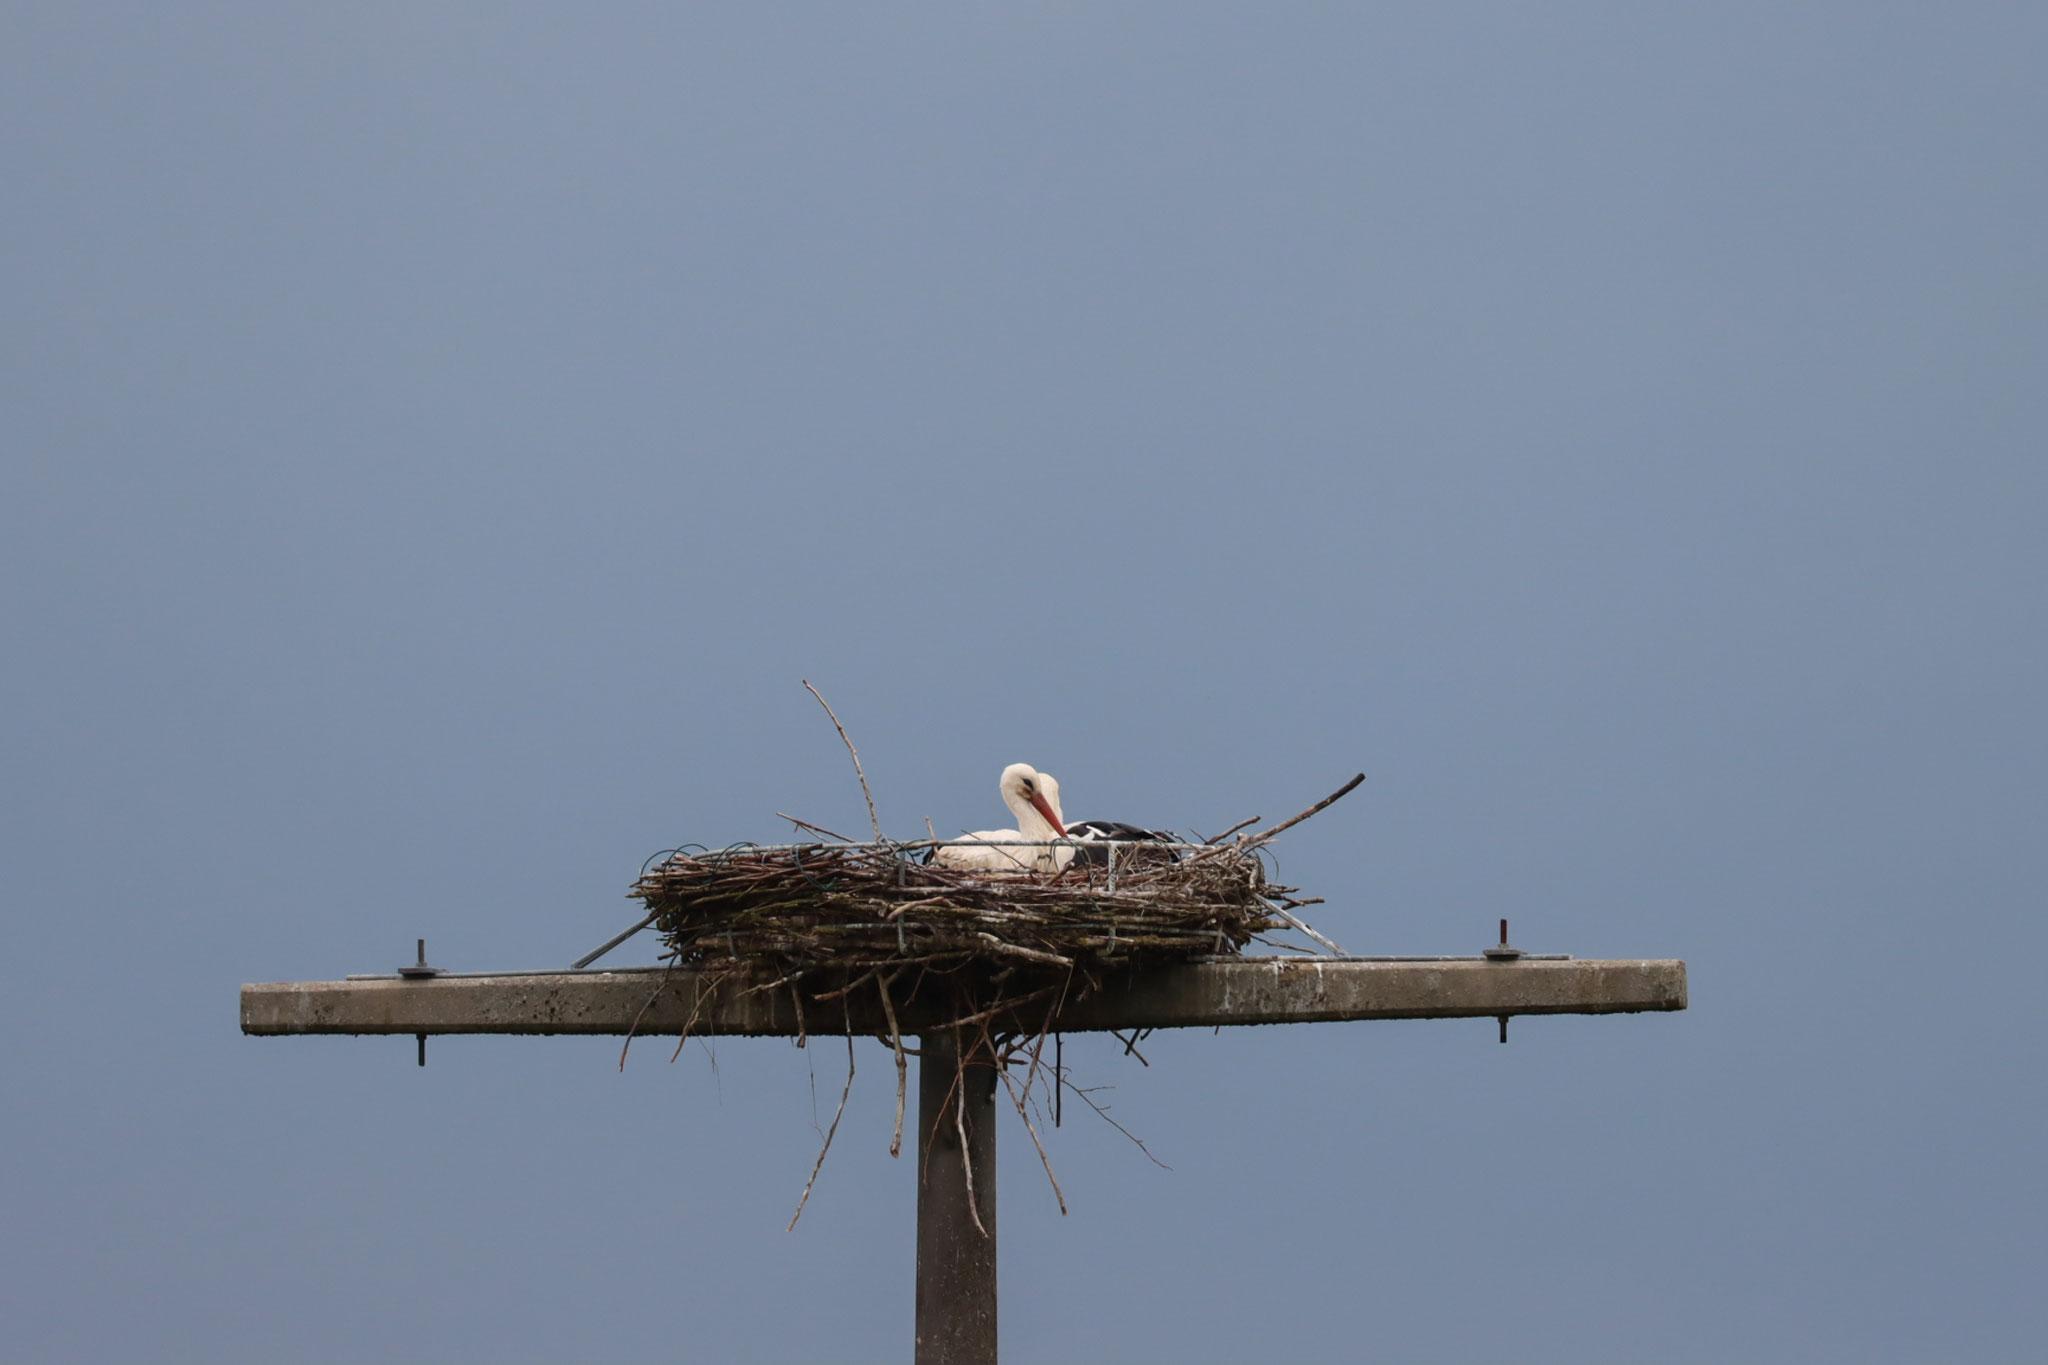 Storchenpaar im Nest am 10.06.20 (Foto: B. Budig)